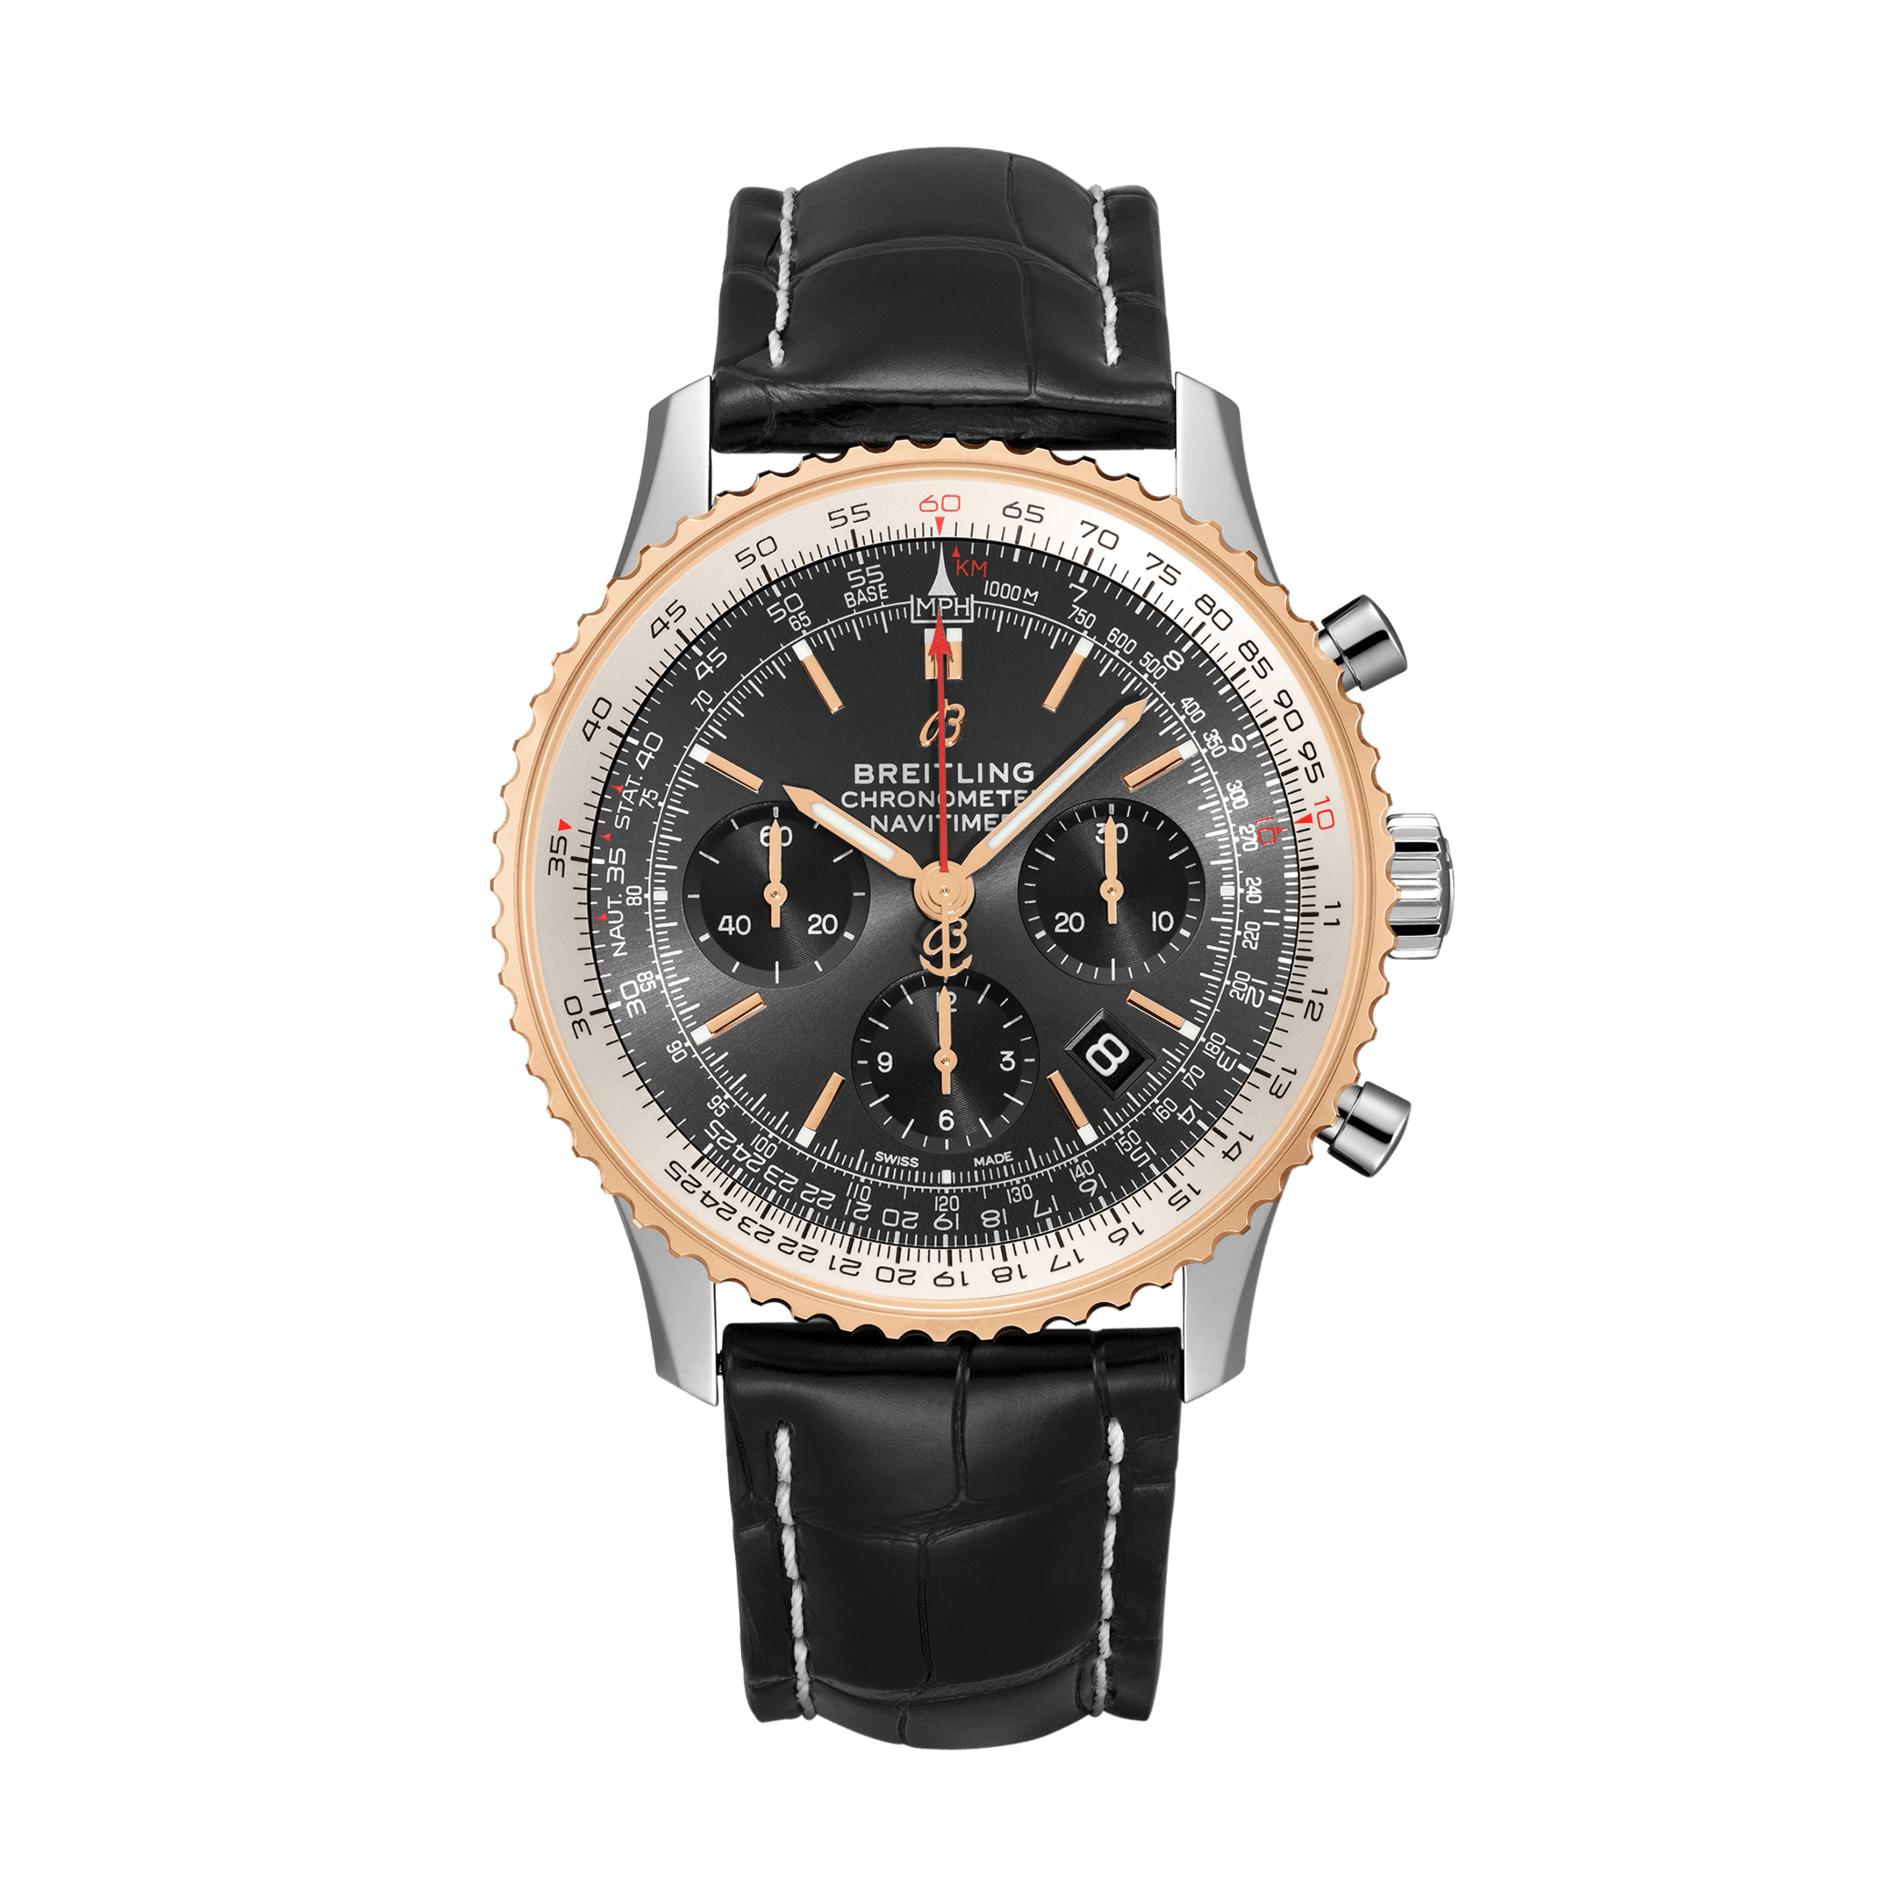 Reloj Breitling – Navitimer 1 B01 Chronograph - Amaya Joyeros